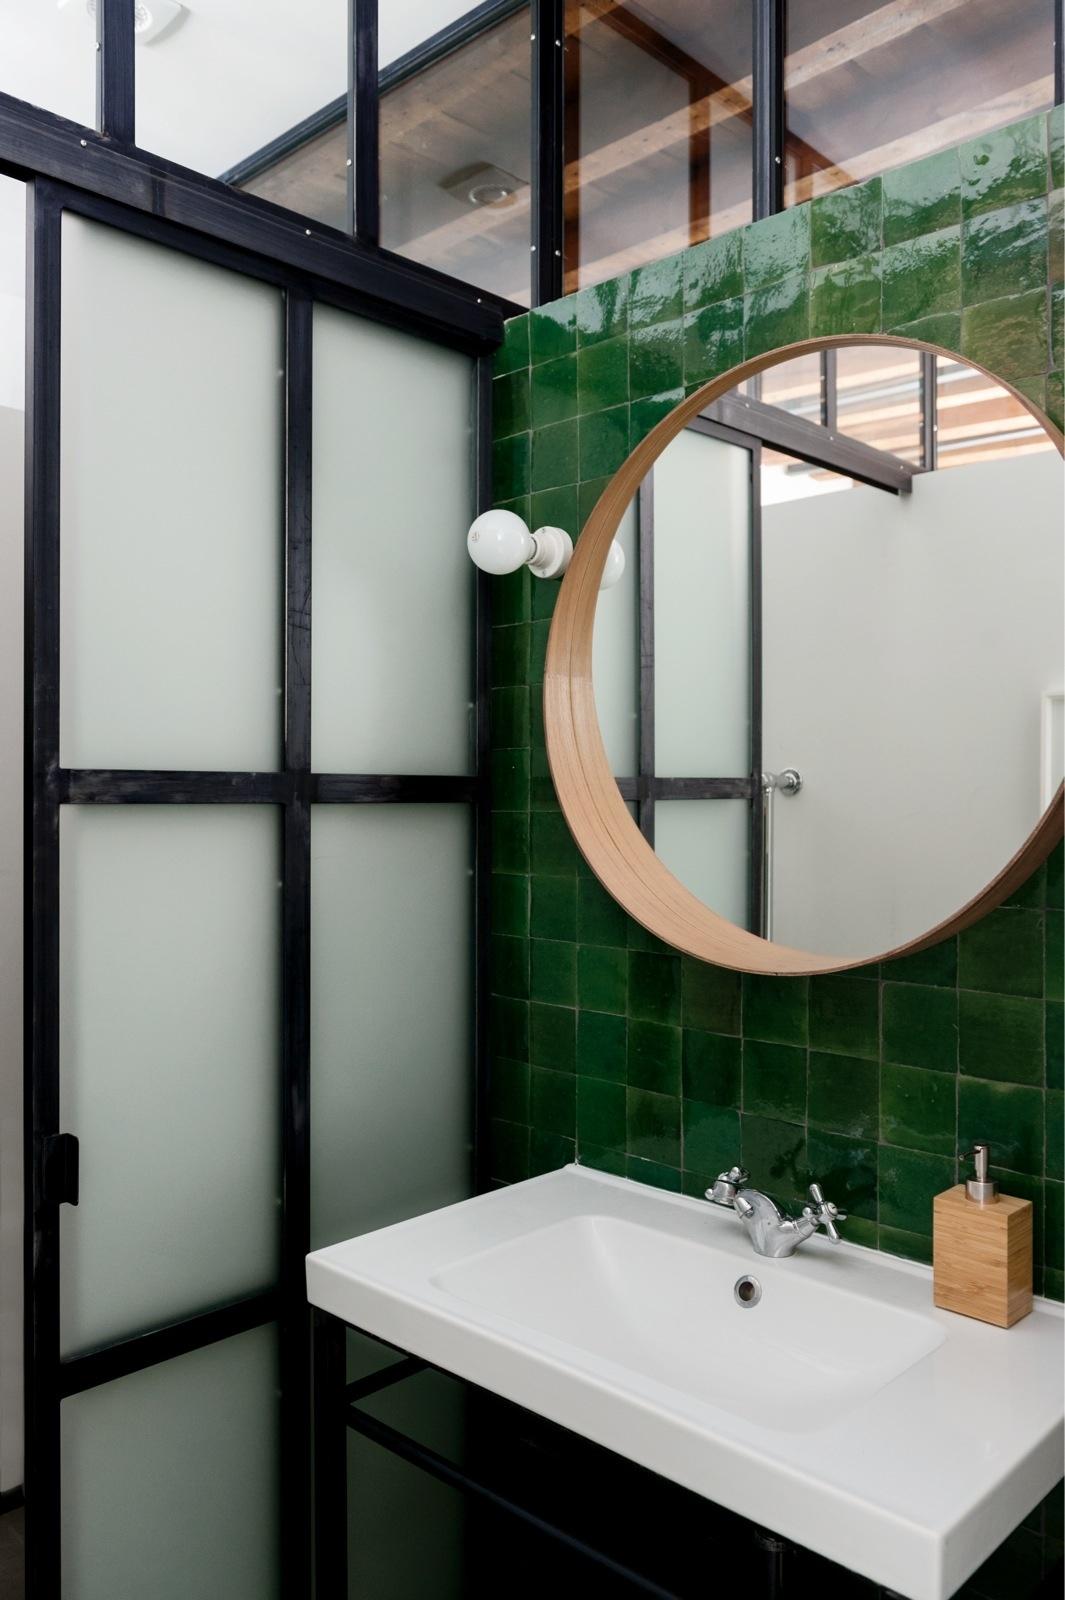 плитка в ванной (галерея 0, фото 6)